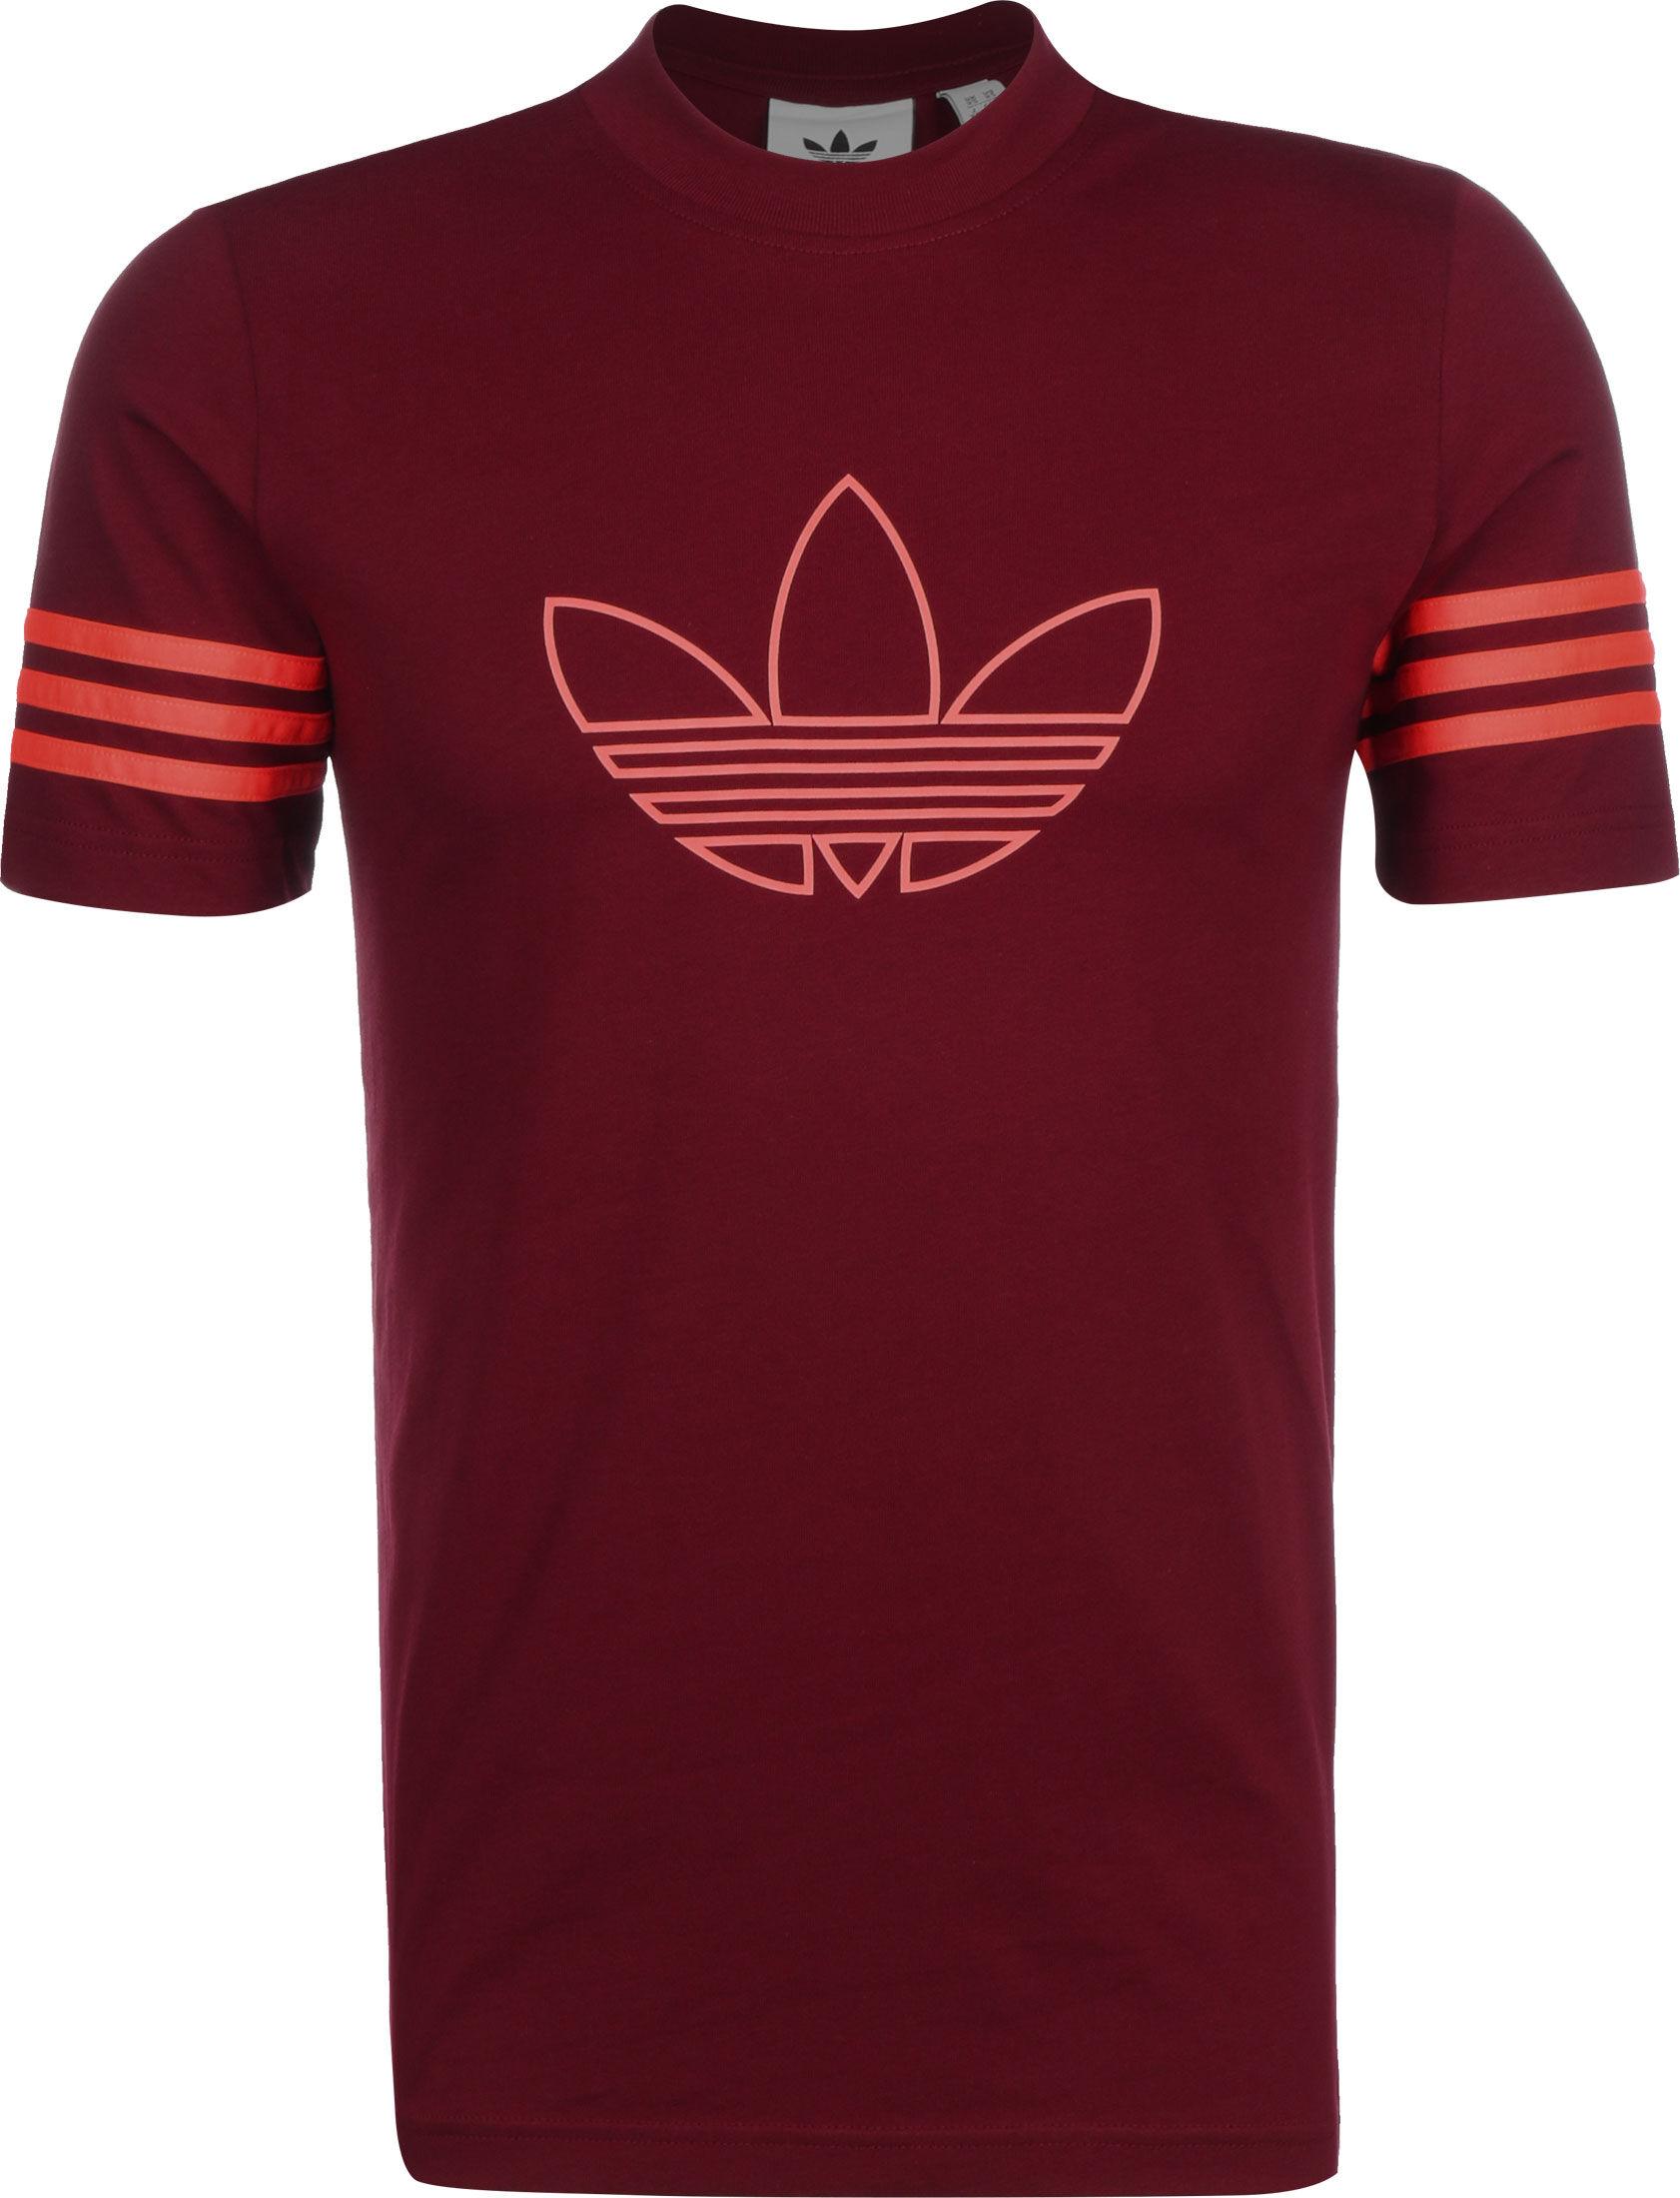 alleanza gestire Incompetenza  adidas Outline - T-Shirt su Stylefile